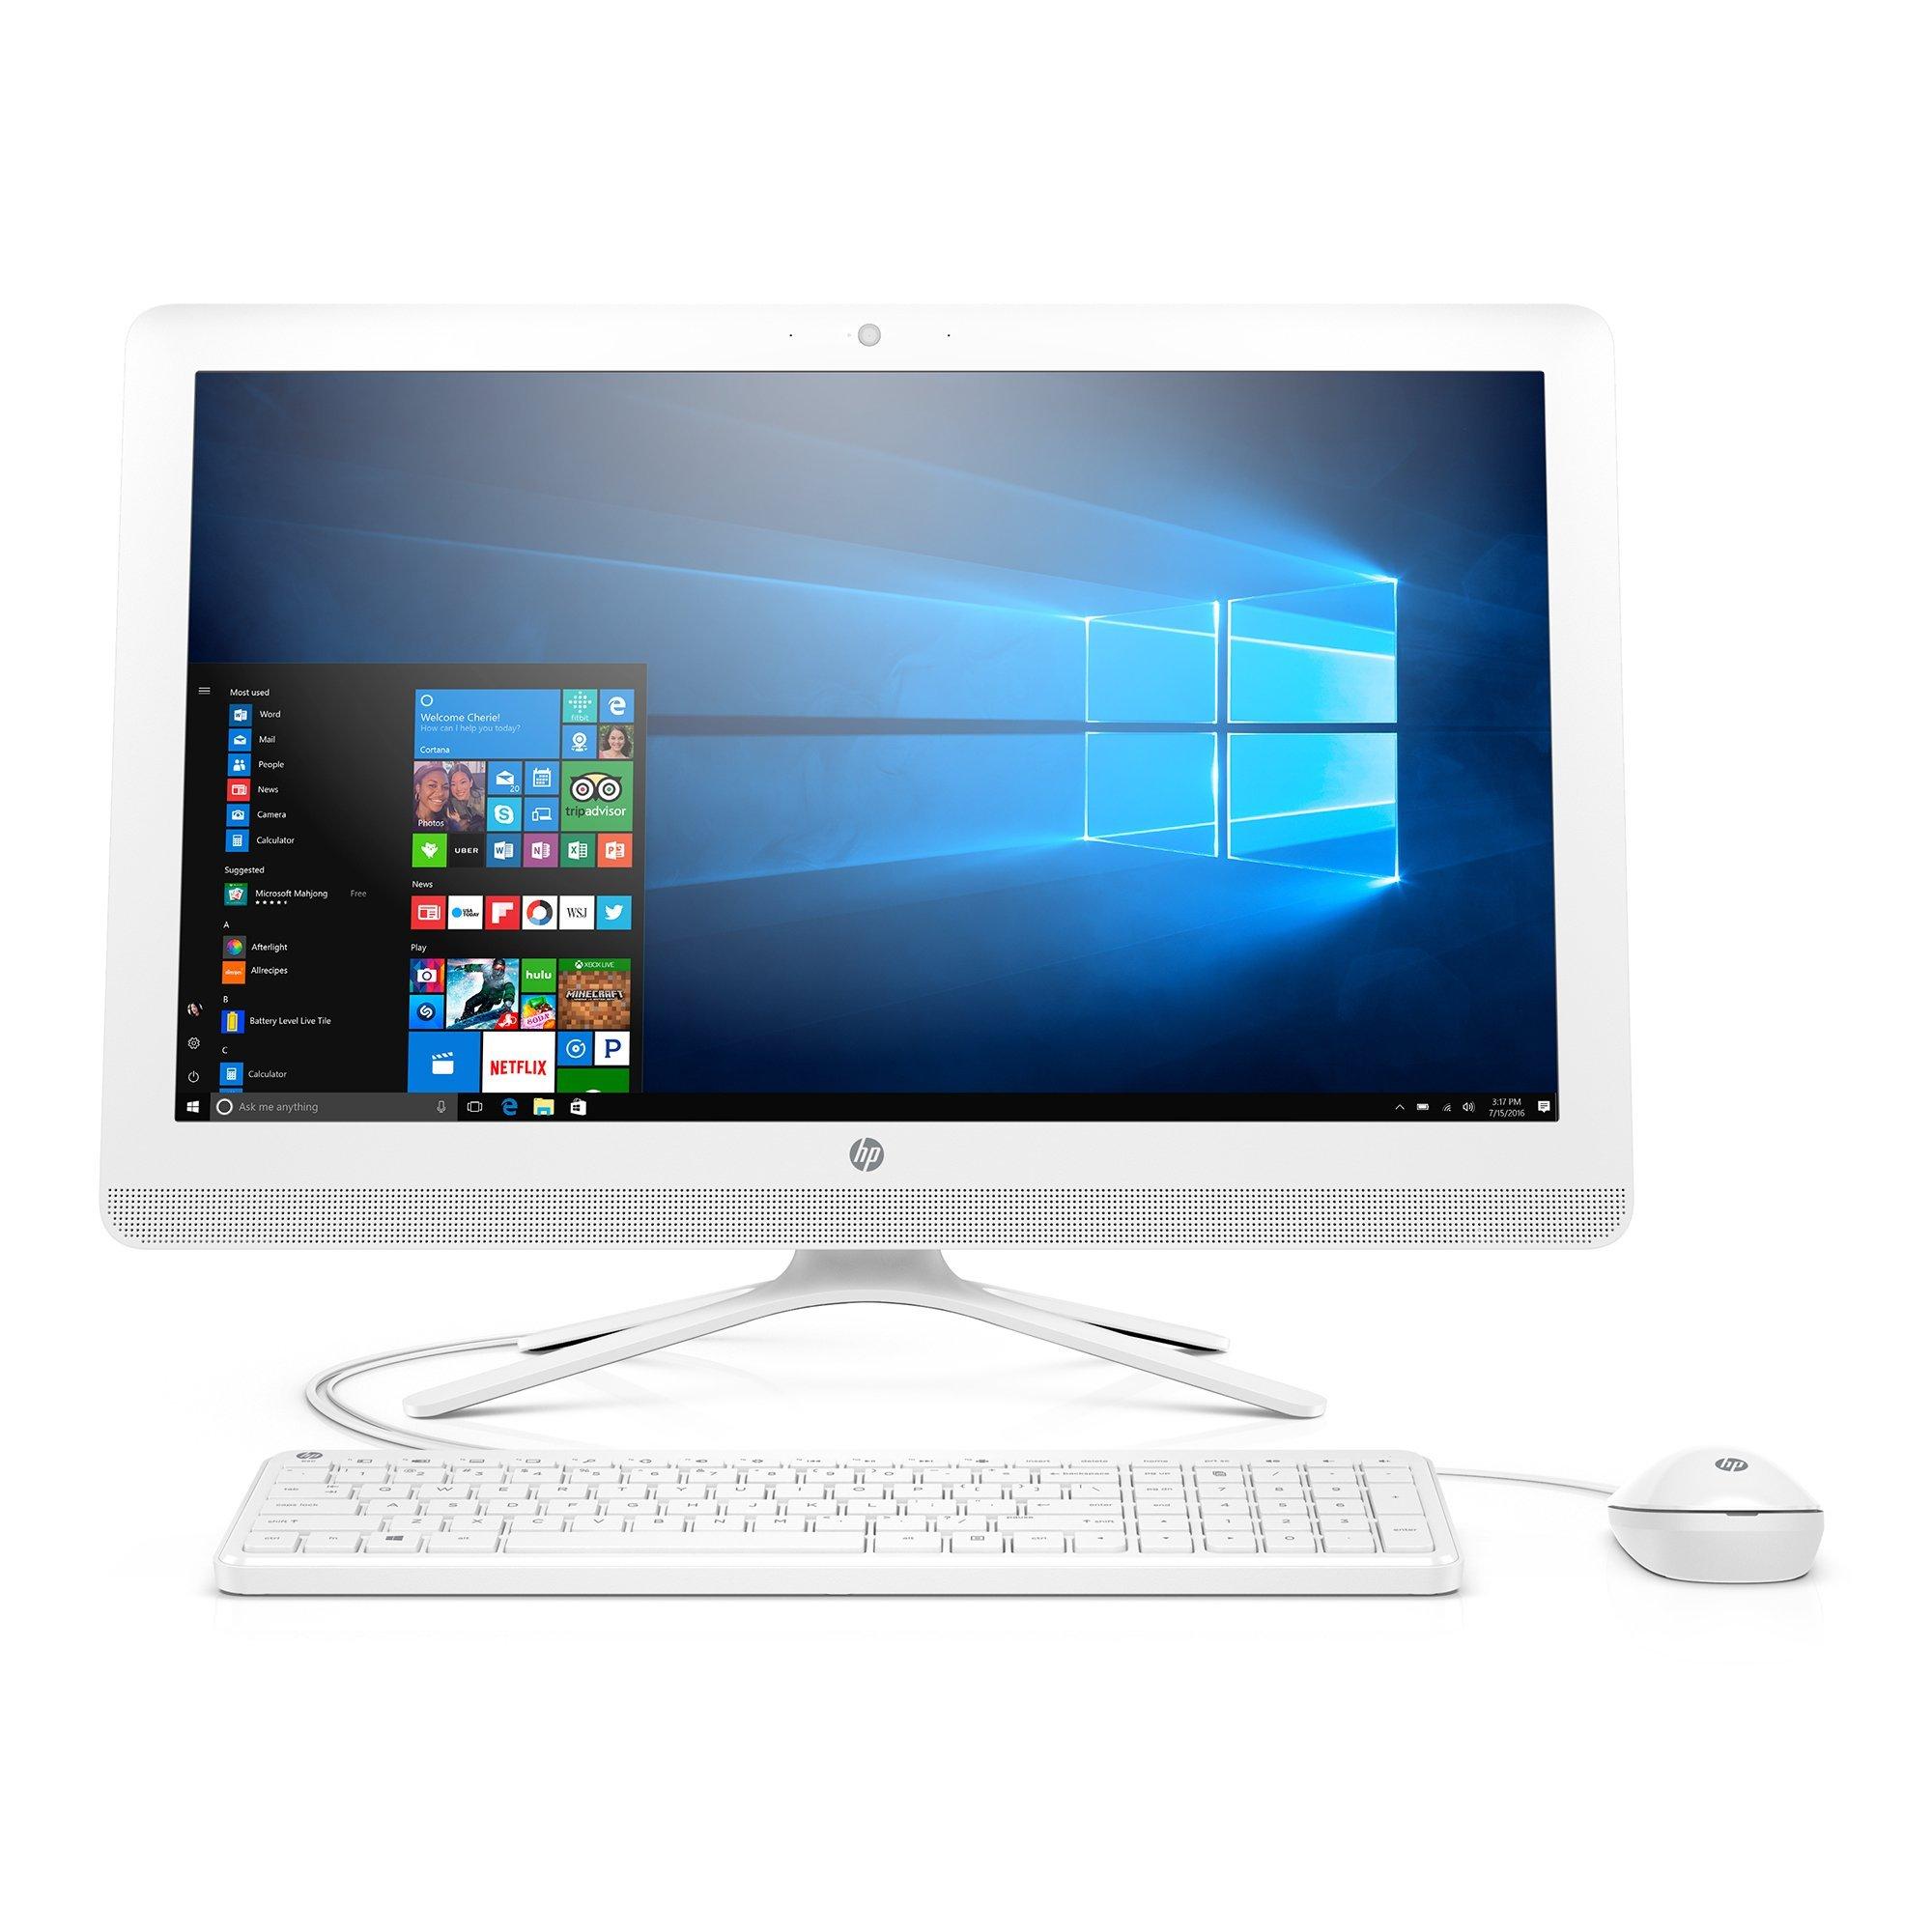 HP 23-inch All-in-One Computer, Intel Pentium J4205, 8GB RAM, 1TB hard drive,  Windows 10 (24-g216, White)